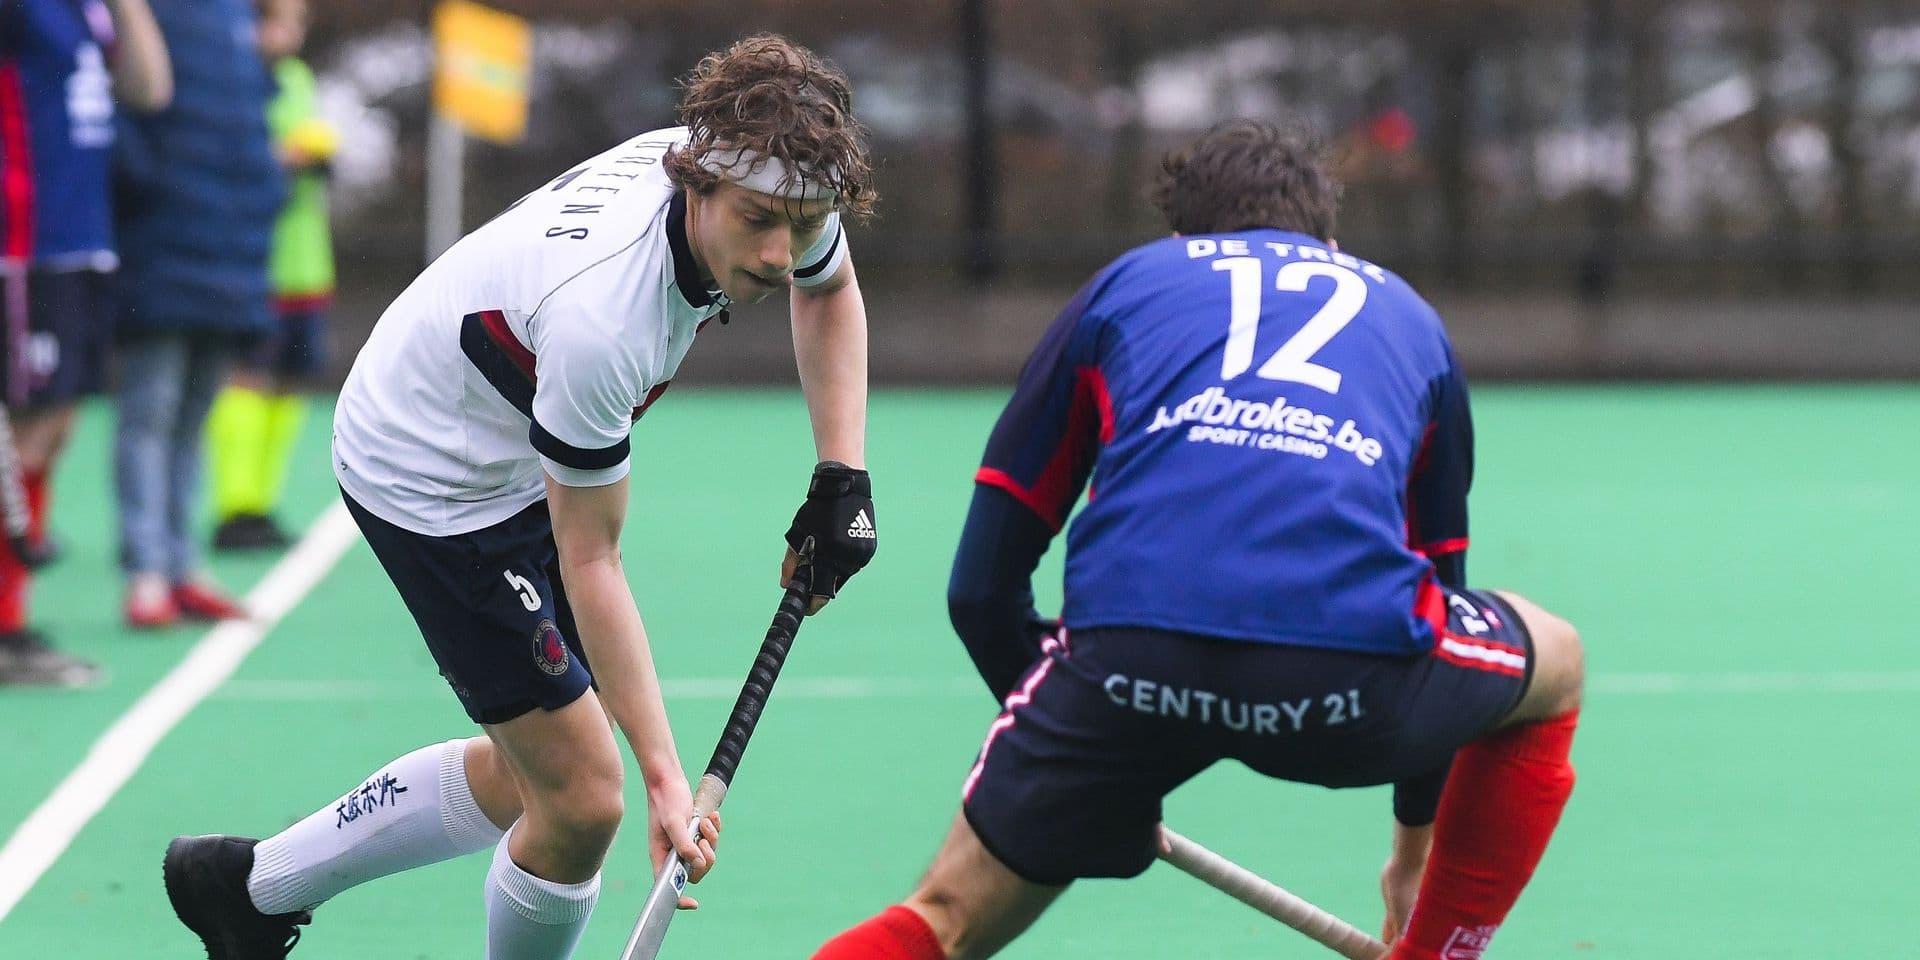 L'ARBH ordonne la fin des championnats de Belgique de hockey: ni champion, ni descendants